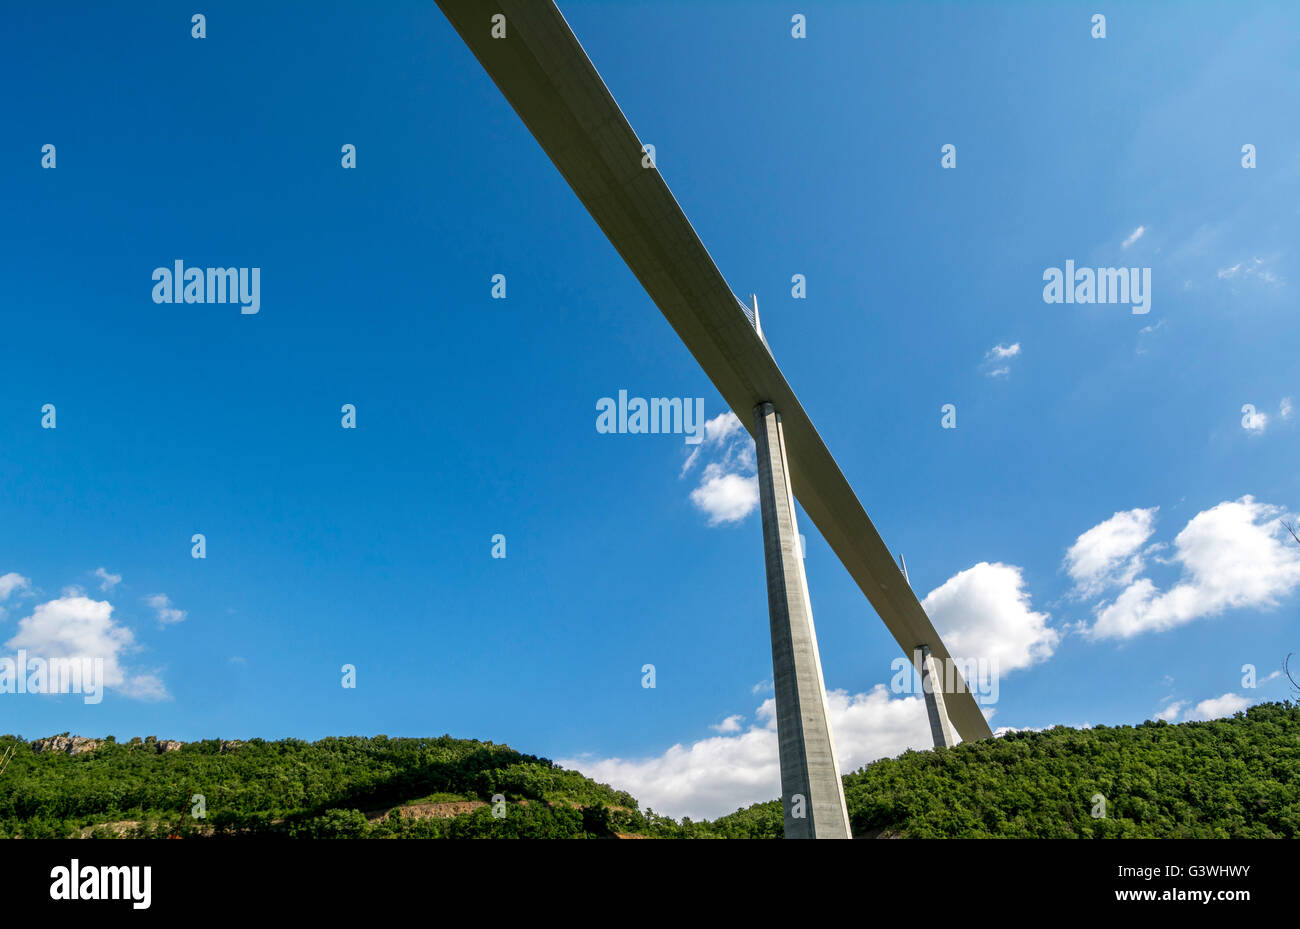 Millau Viaduct, Natural Regional Park of Grands Causses, Aveyron, Languedoc-Roussillon-Midi-Pyrénées, - Stock Image